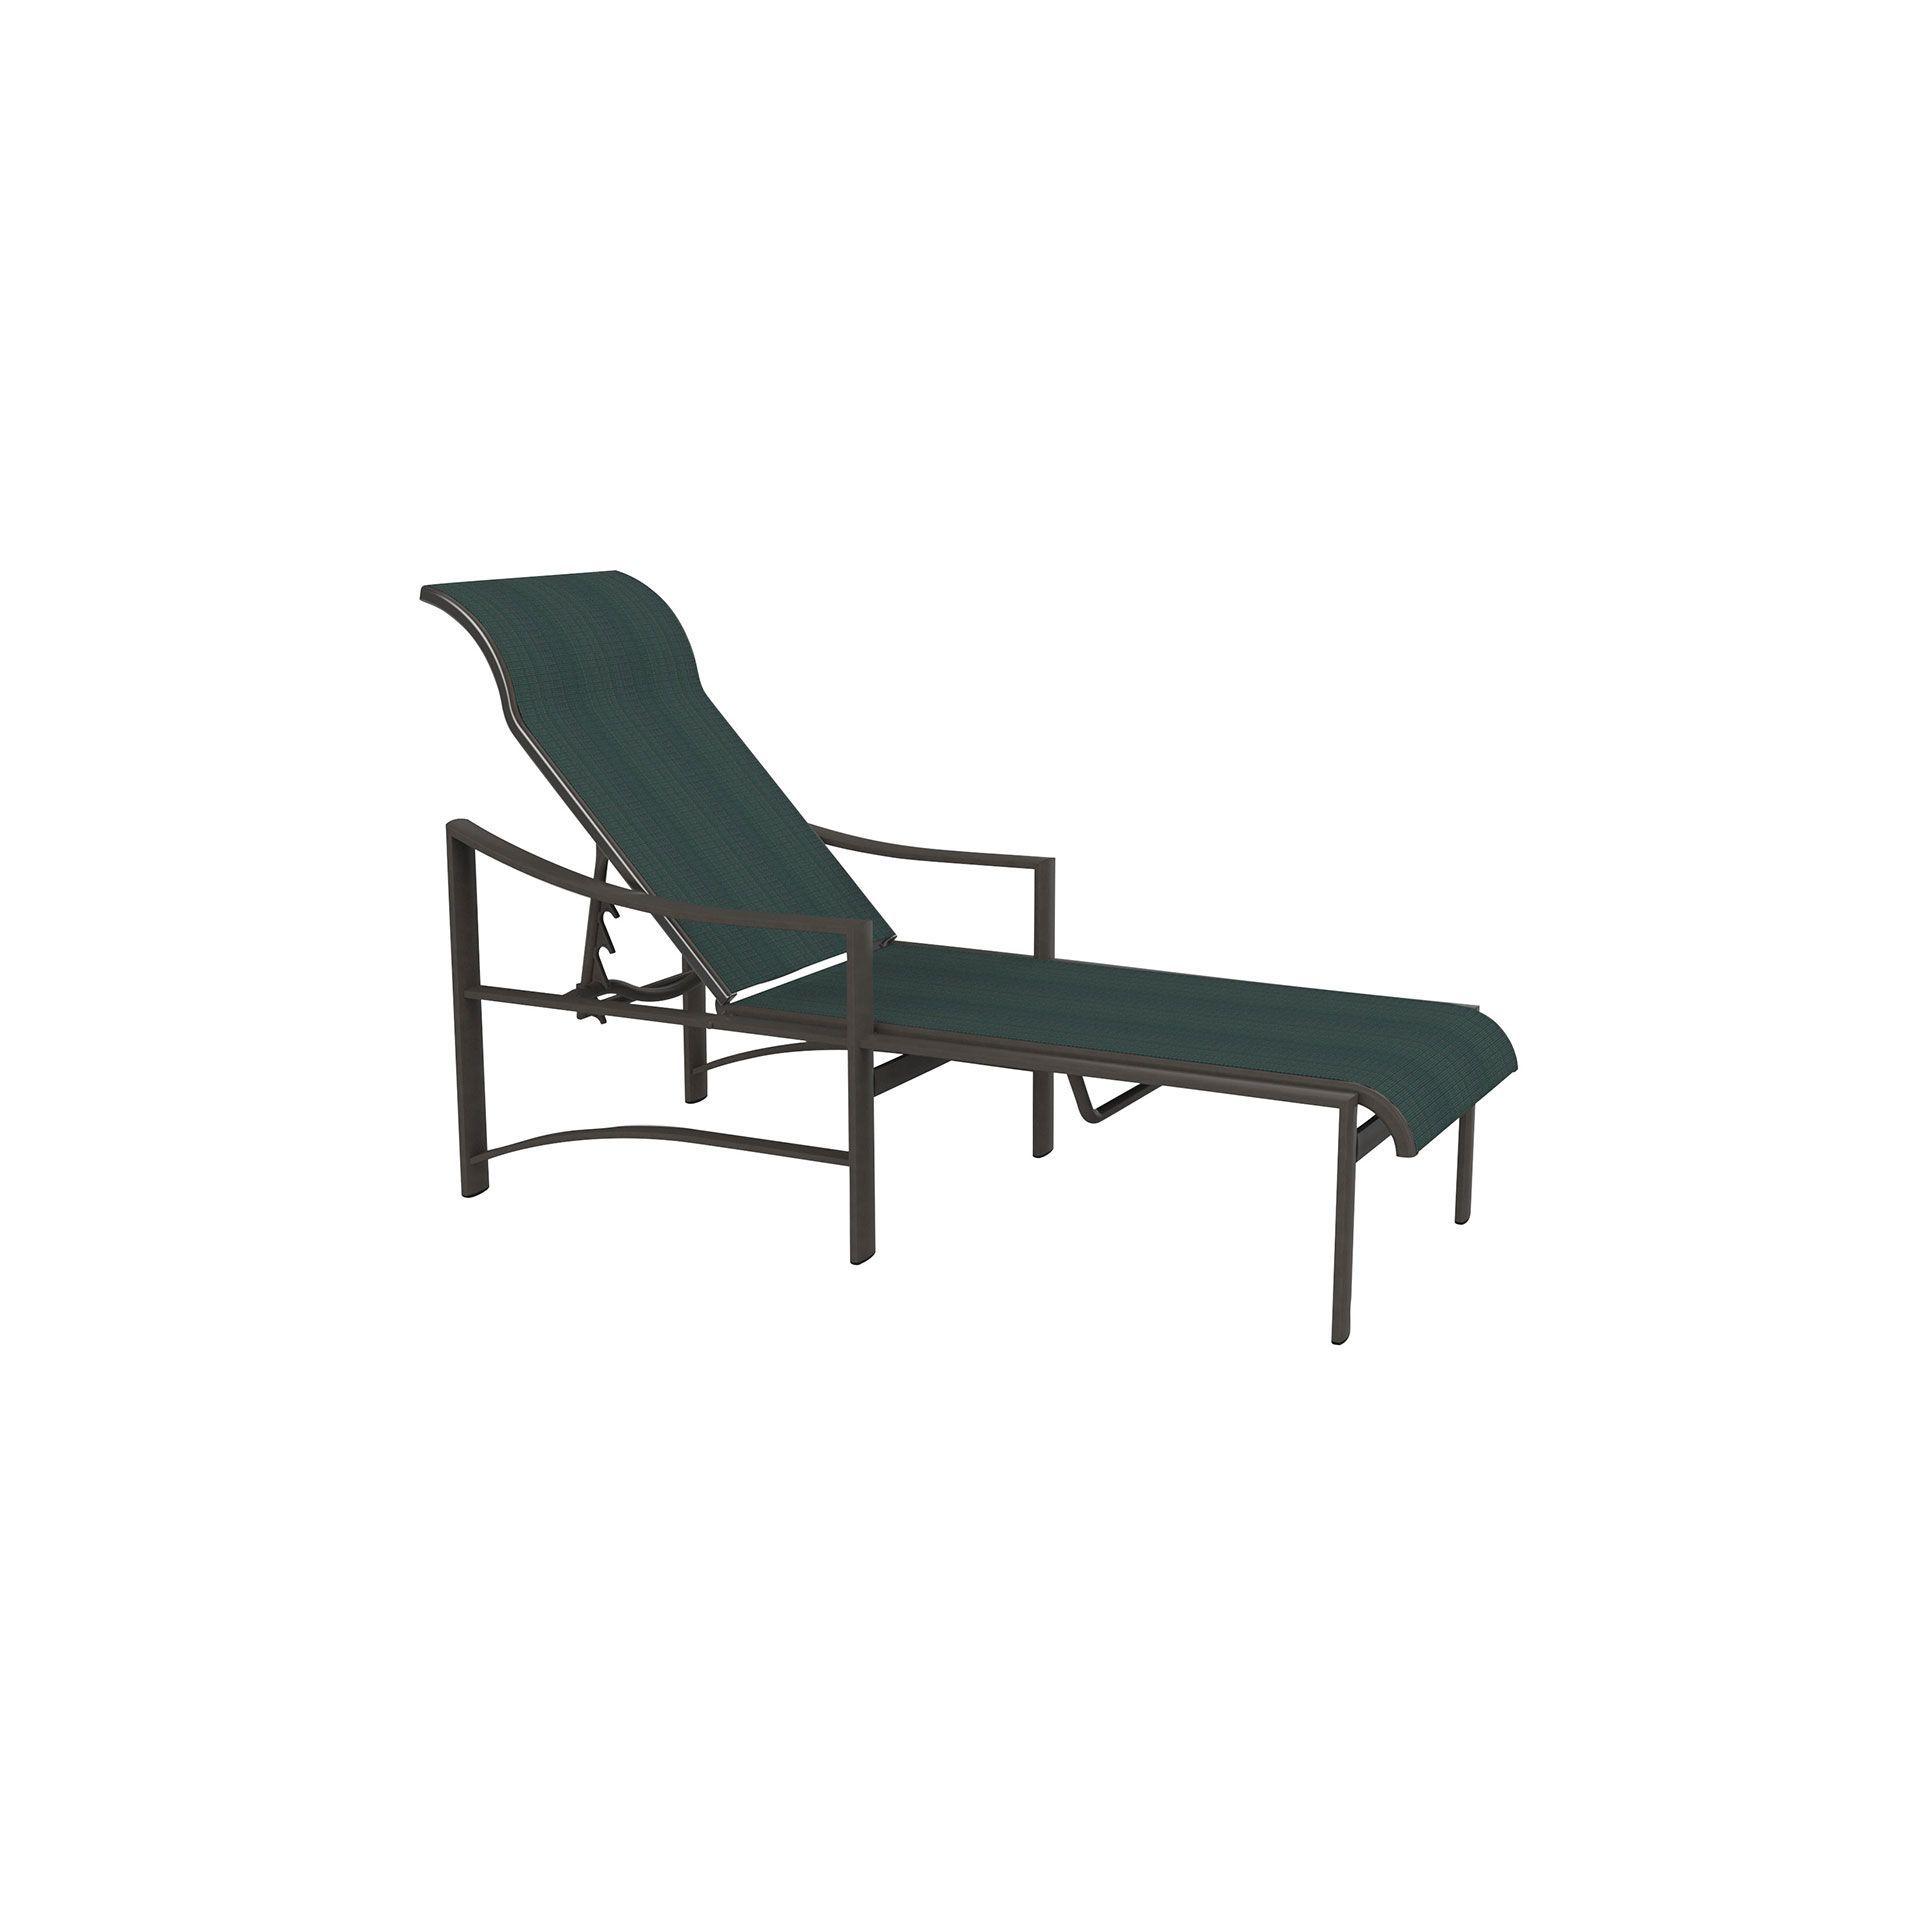 Tropitone Kenzo Sling Chaise Lounge Leisure Living